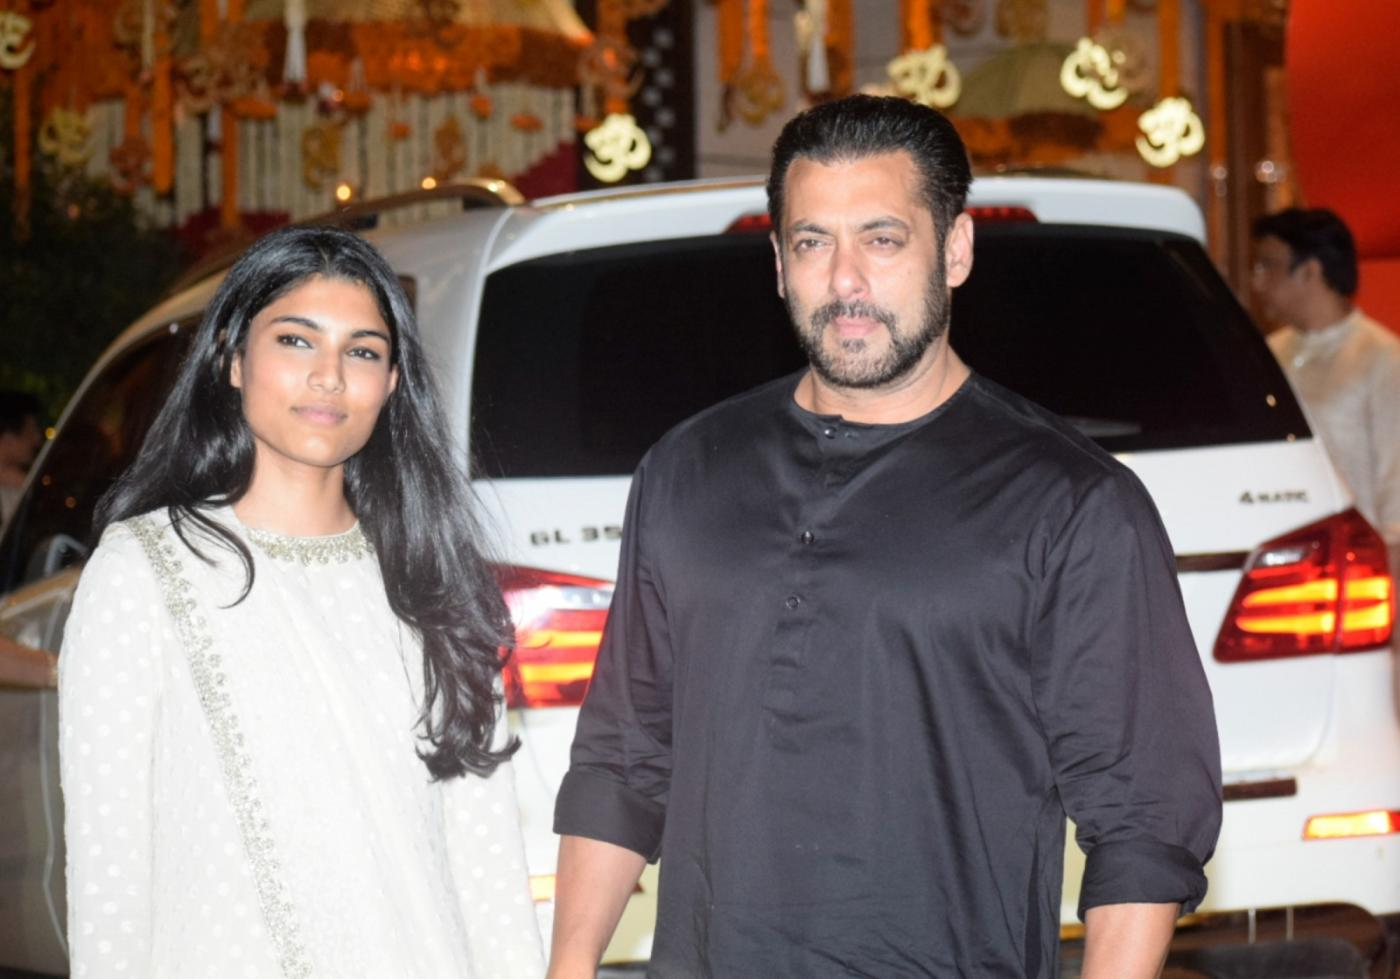 Mumbai: Actor Salman Khan arrives at Reliance Industries Chairman and MD Mukesh Ambani's residence to celebrate Ganesh Chaturthi in Mumbai on Sept 13, 2018. (Photo: IANS) by .